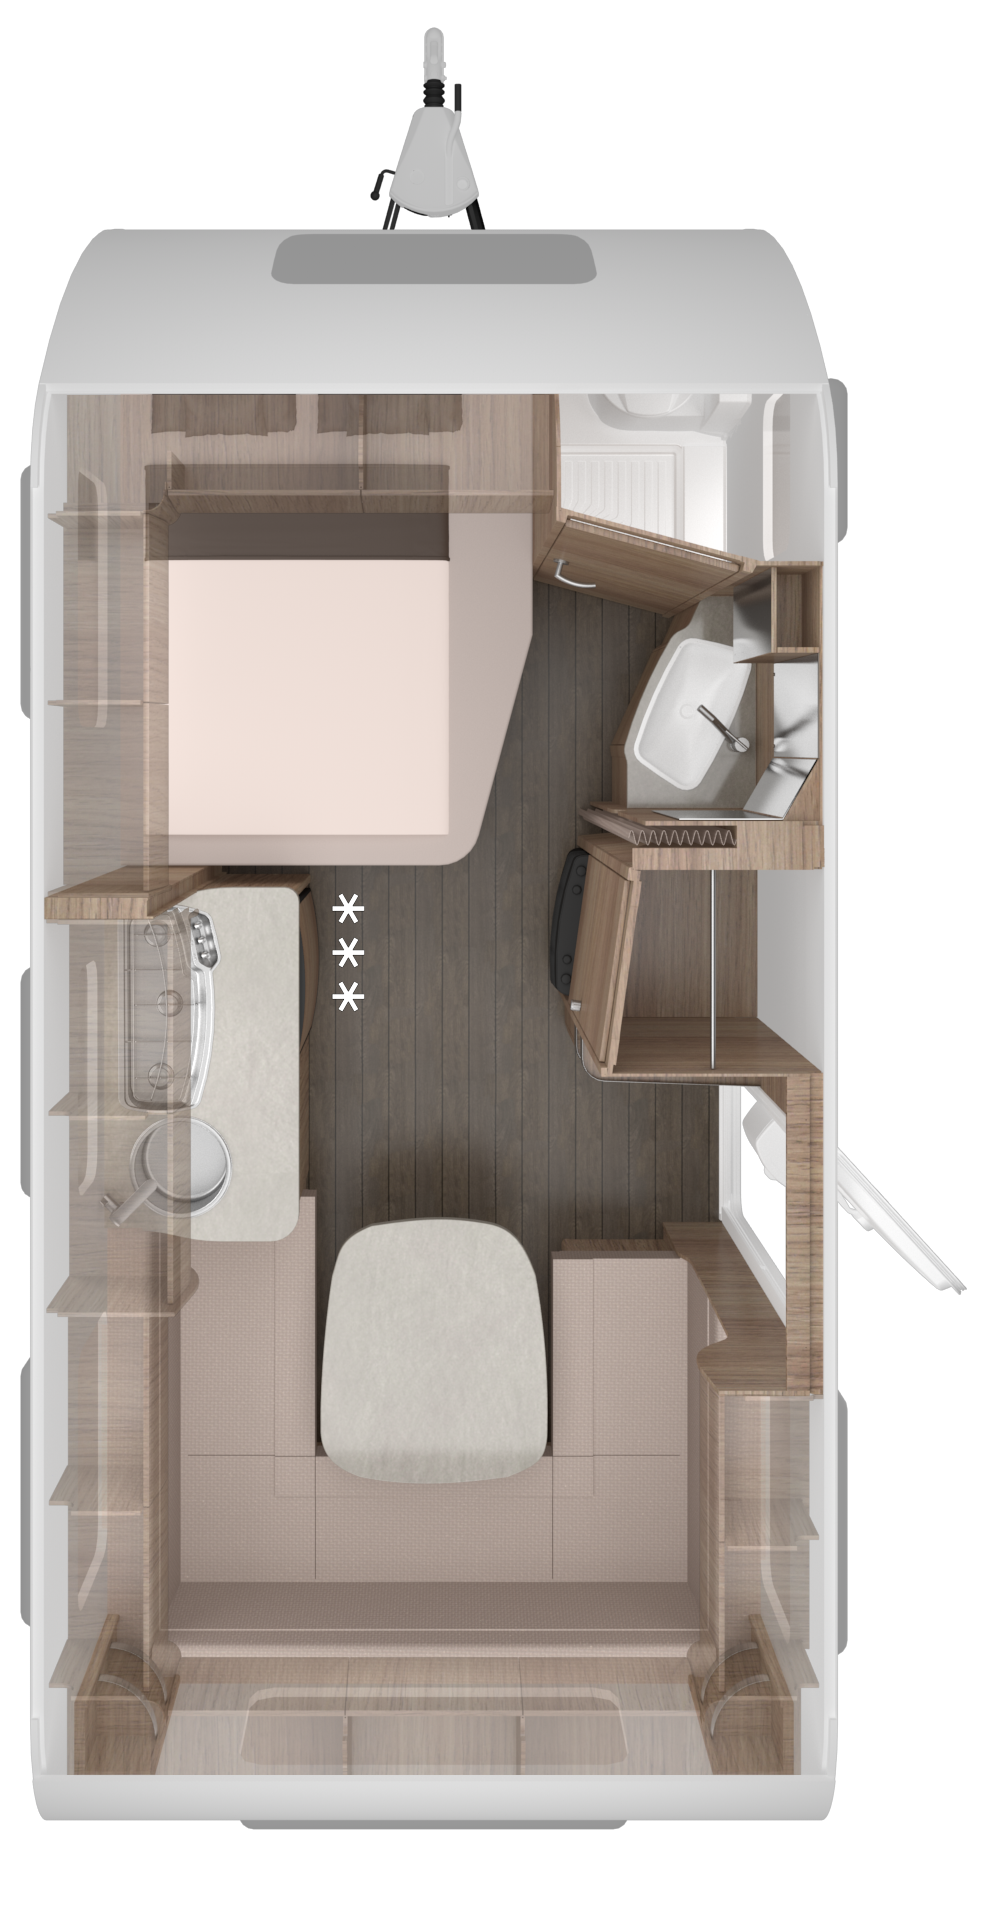 Astonishing Knaus Sport Silver Selection Caravan Centrum Meerkerk Unemploymentrelief Wooden Chair Designs For Living Room Unemploymentrelieforg